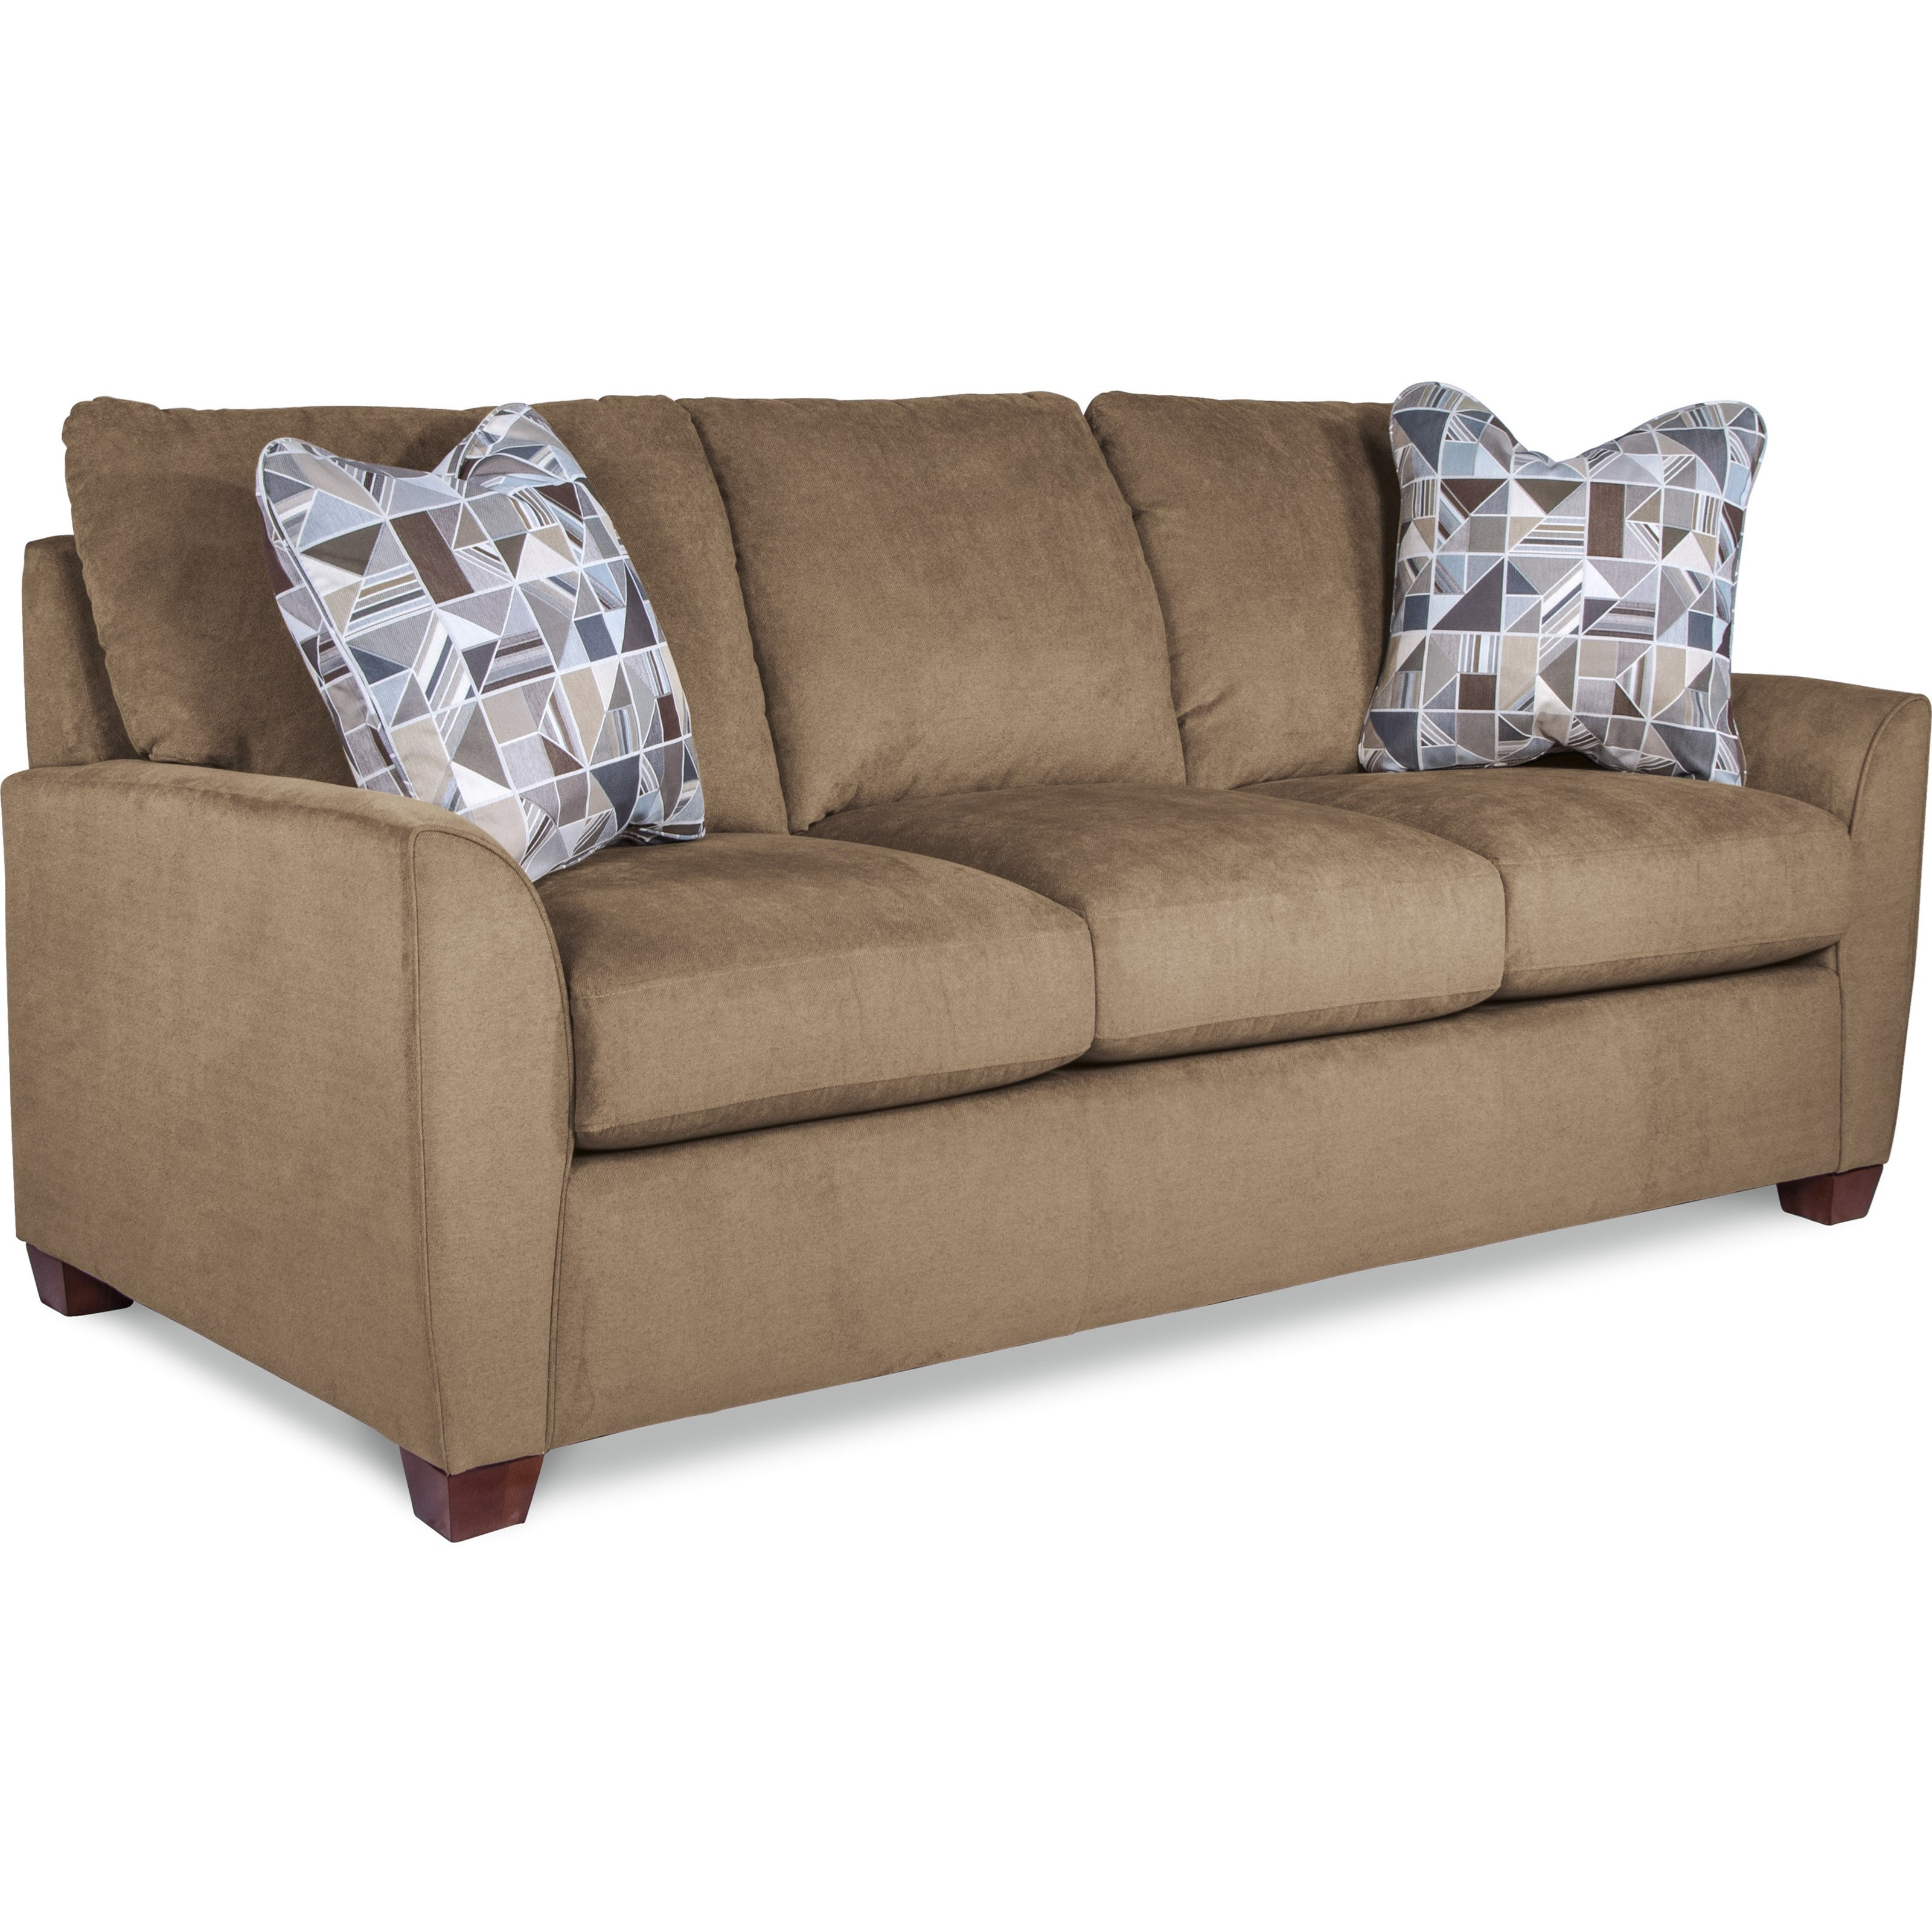 La Z Boy Amy Casual Sofa With Premier Comfortcore Cushions